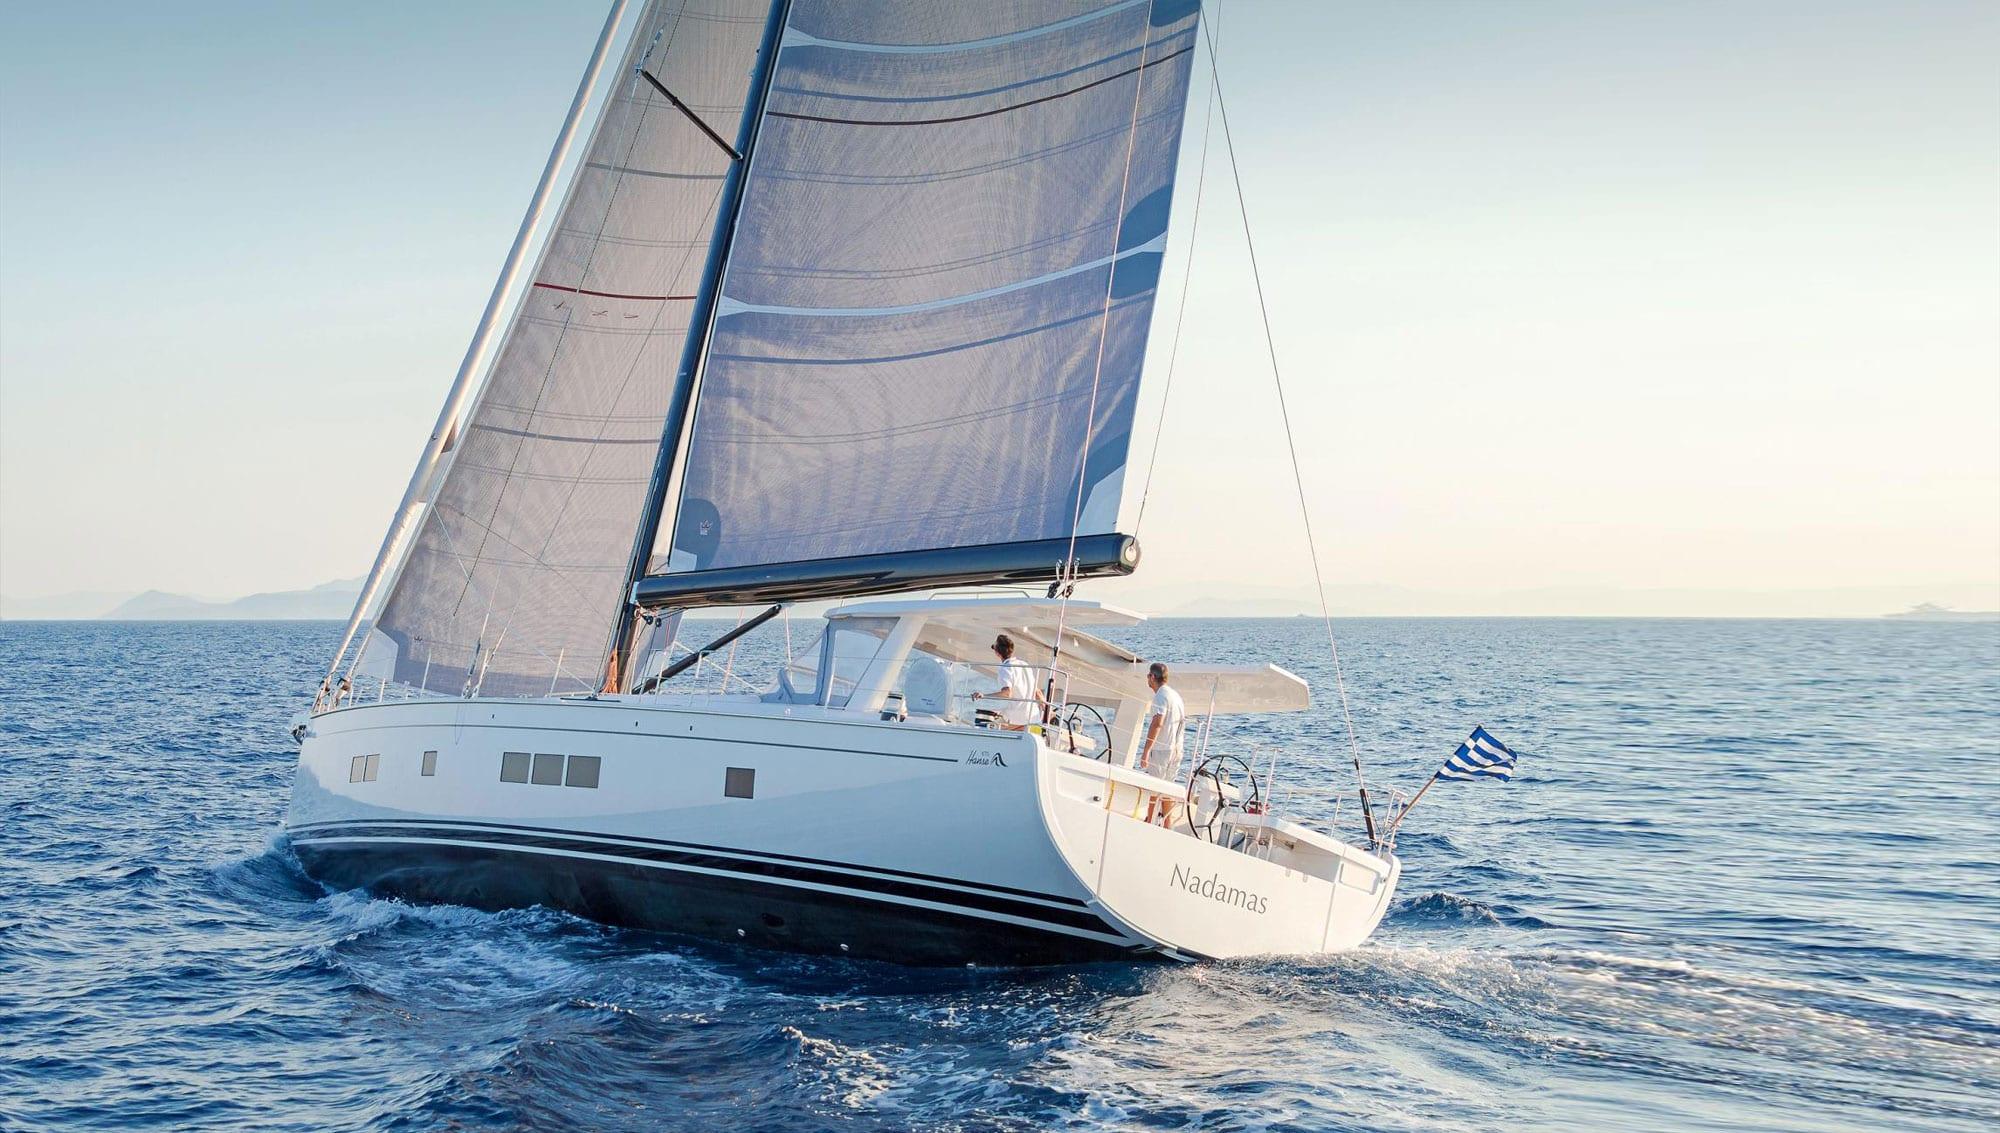 hmpg valef yachts nadamas -  Valef Yachts Chartering - 5920